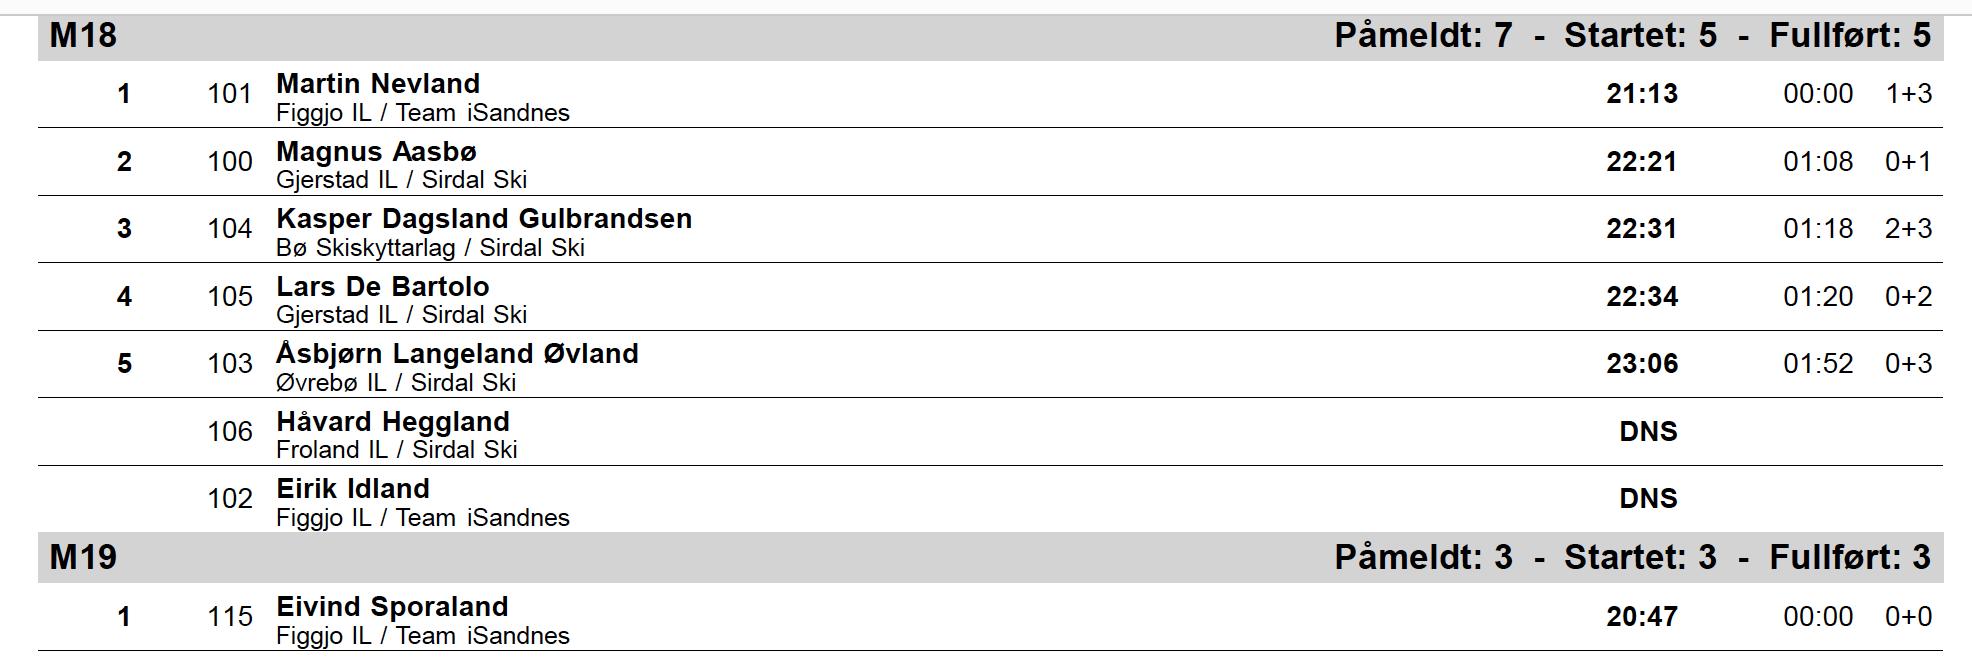 Macintosh HD:Users:Lsir:Dropbox:Skjermbilder:Skjermbilde 2019-01-20 23.03.07.png